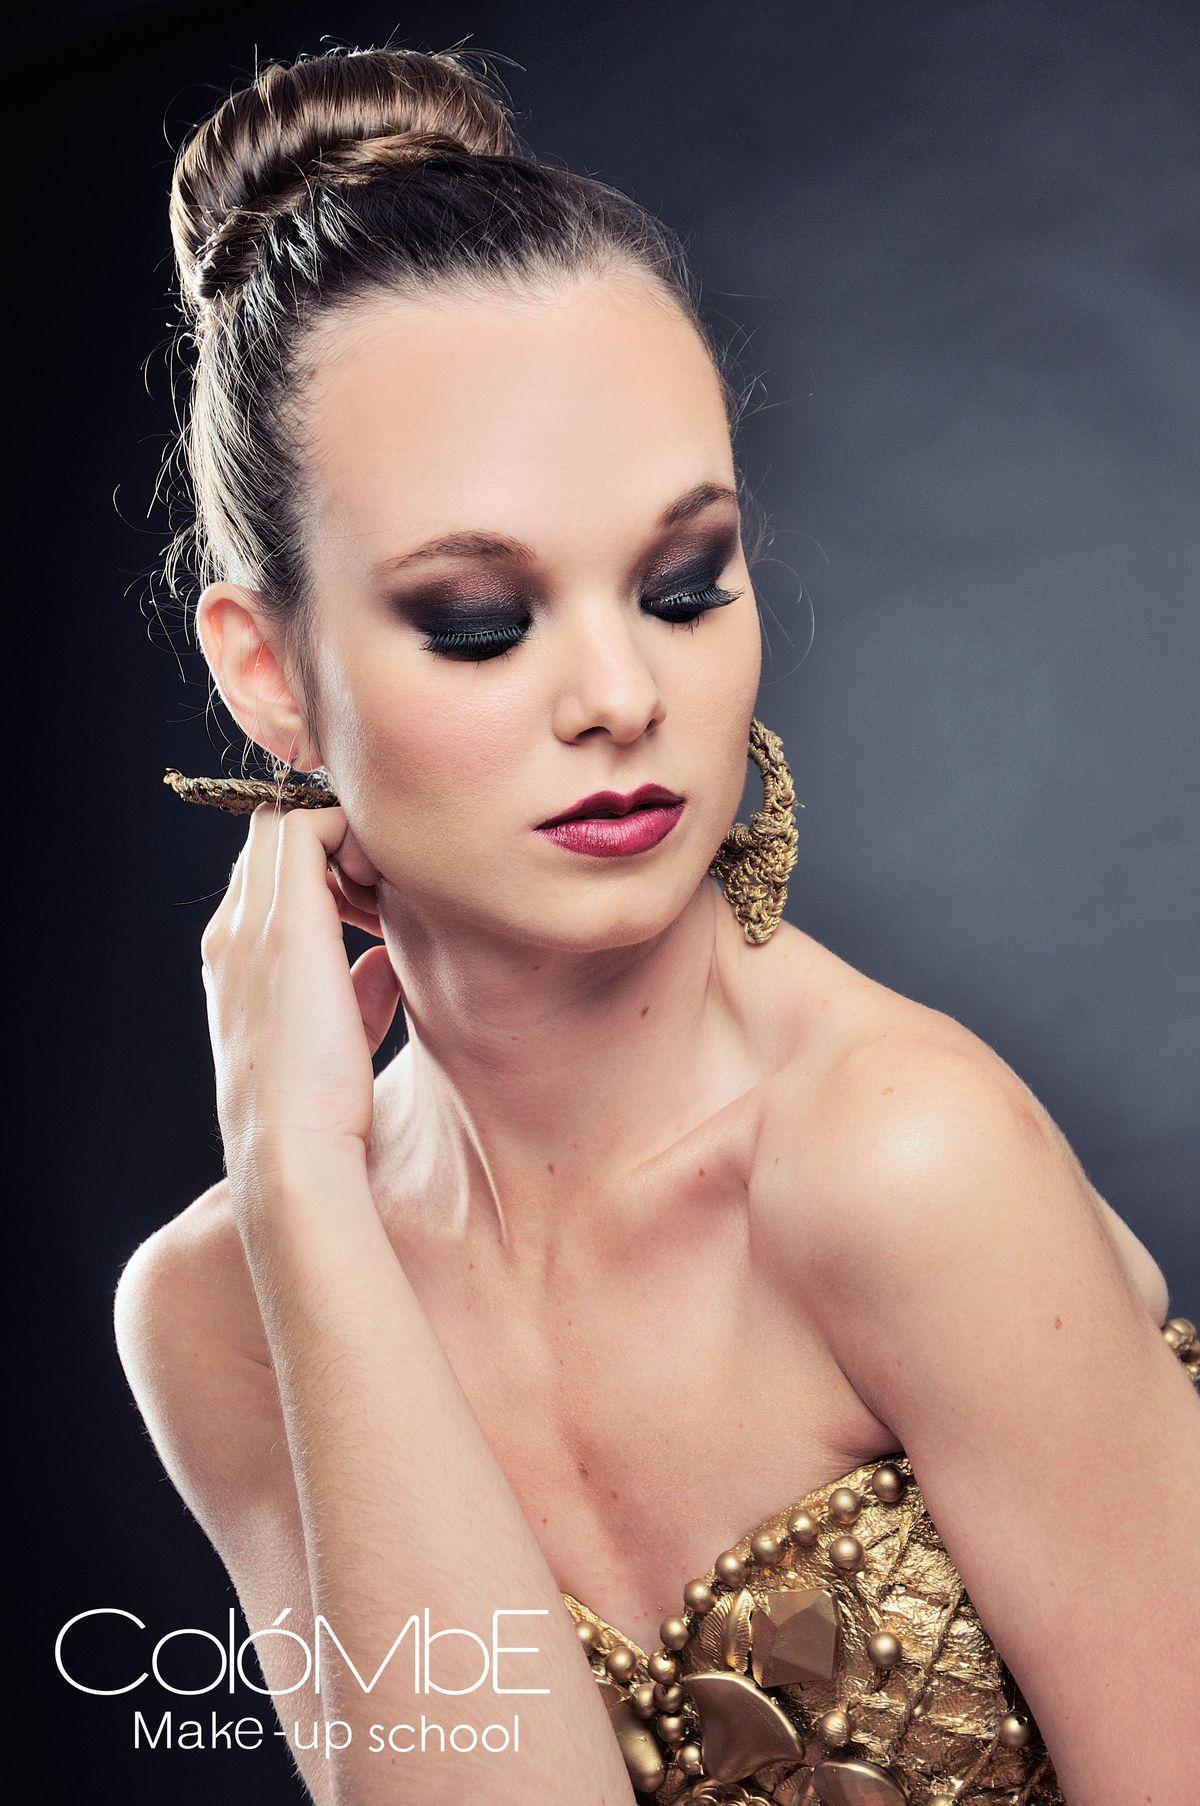 d09ab9875be2e43f2a3035b8450d855c - curso de maquillaje profesional mejores equipos